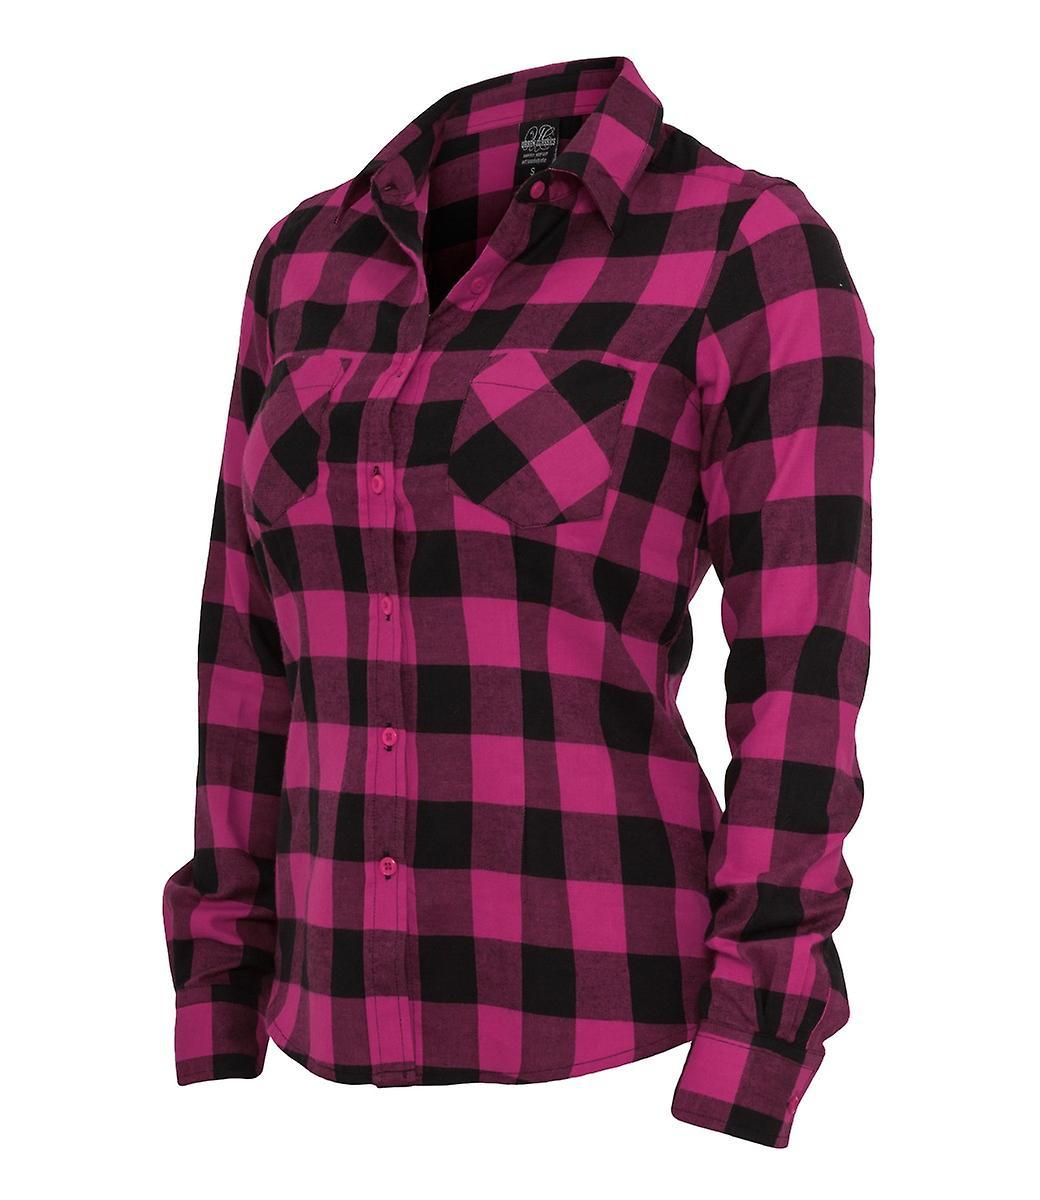 9a3c377a984b Urban classics damer rutig flanellskjorta | Fruugo